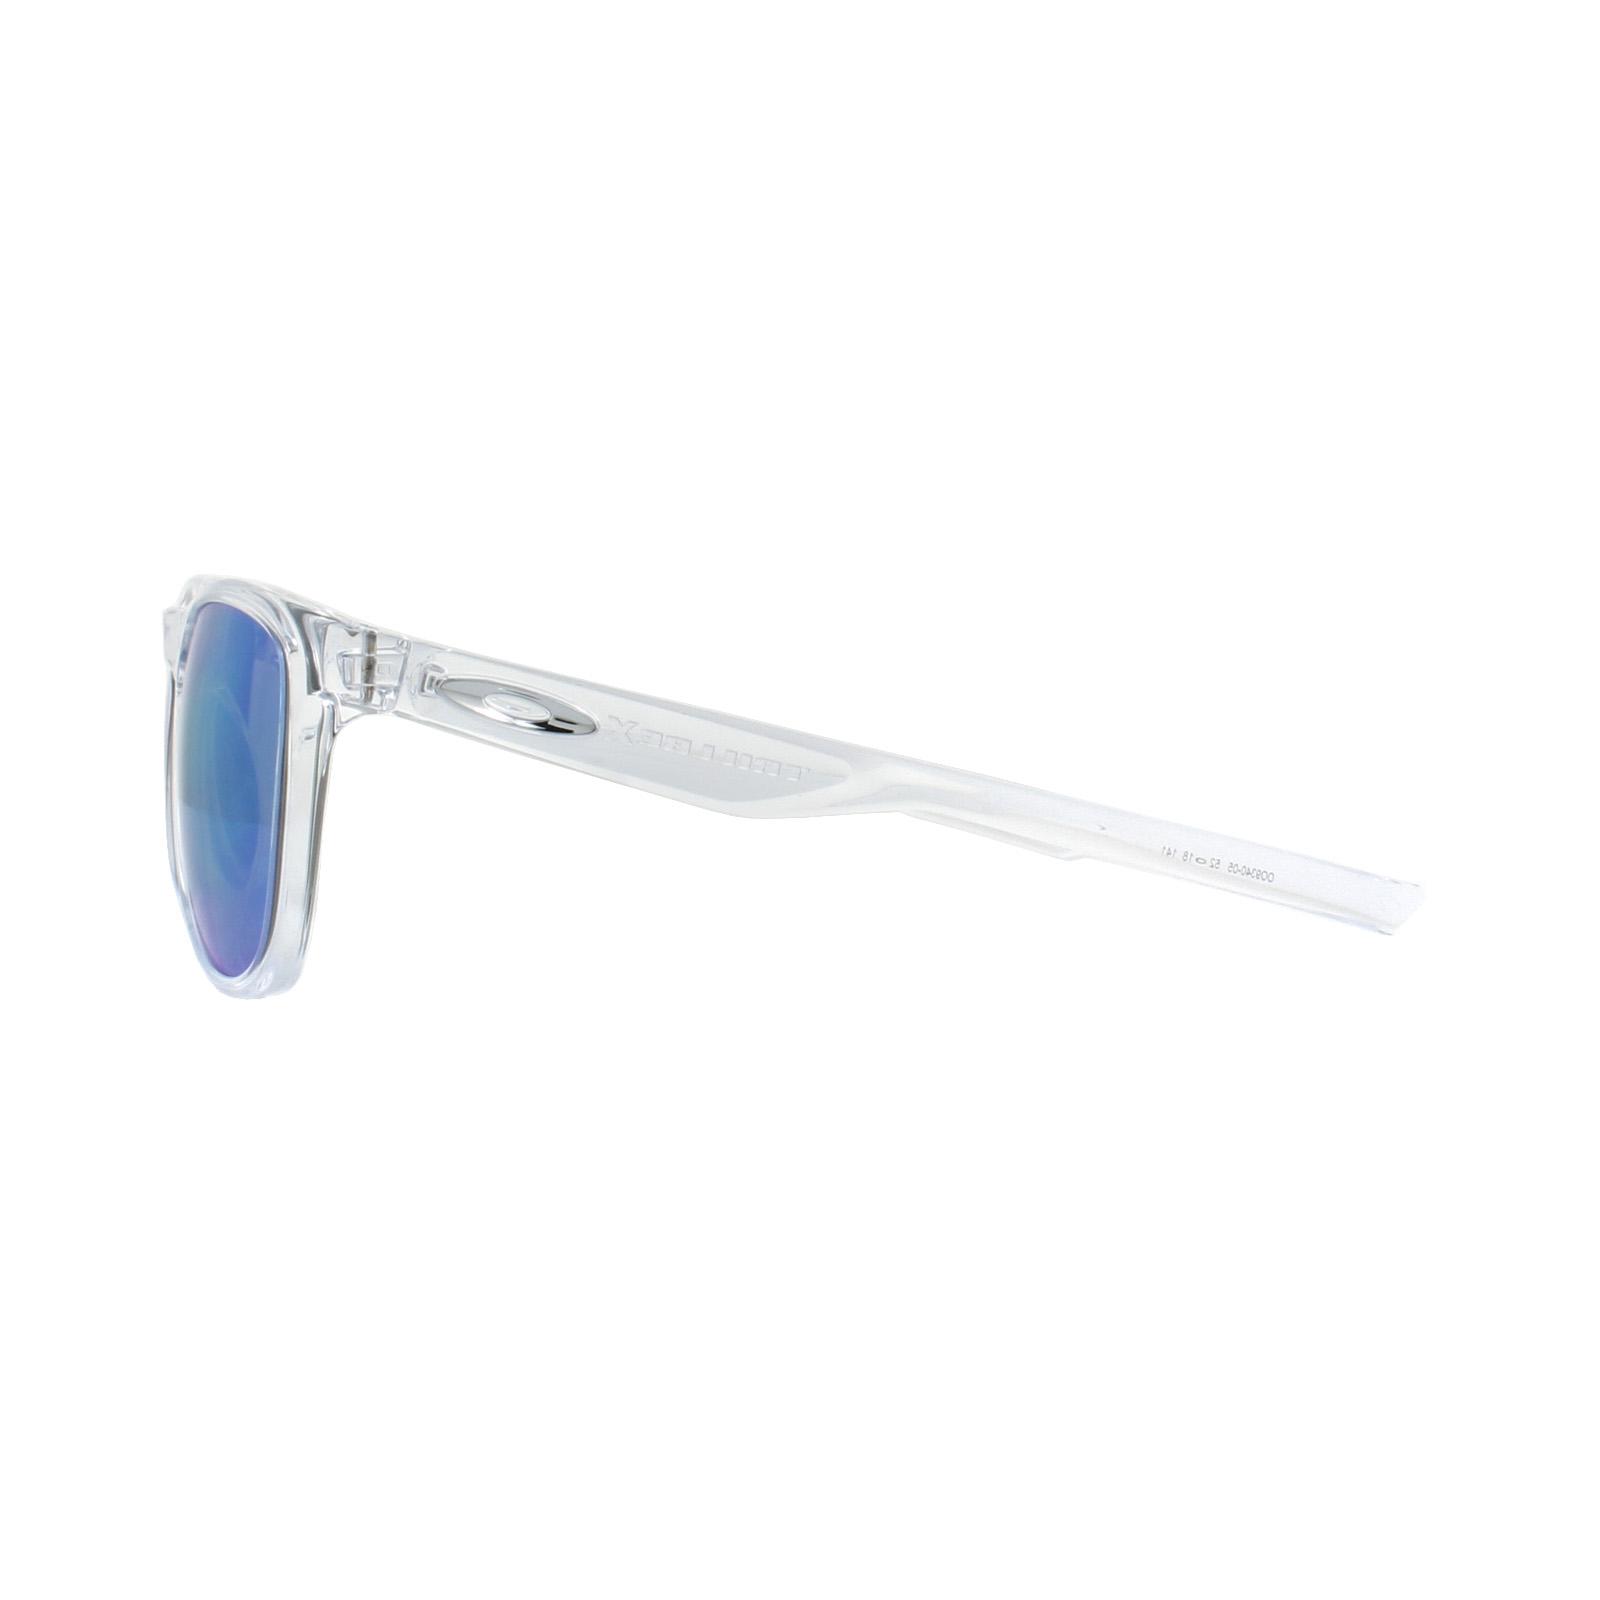 4bc6c1cd63 Sentinel Oakley Sunglasses Trillbe X OO9340-05 Polished Clear Sapphire  Iridium Polarized